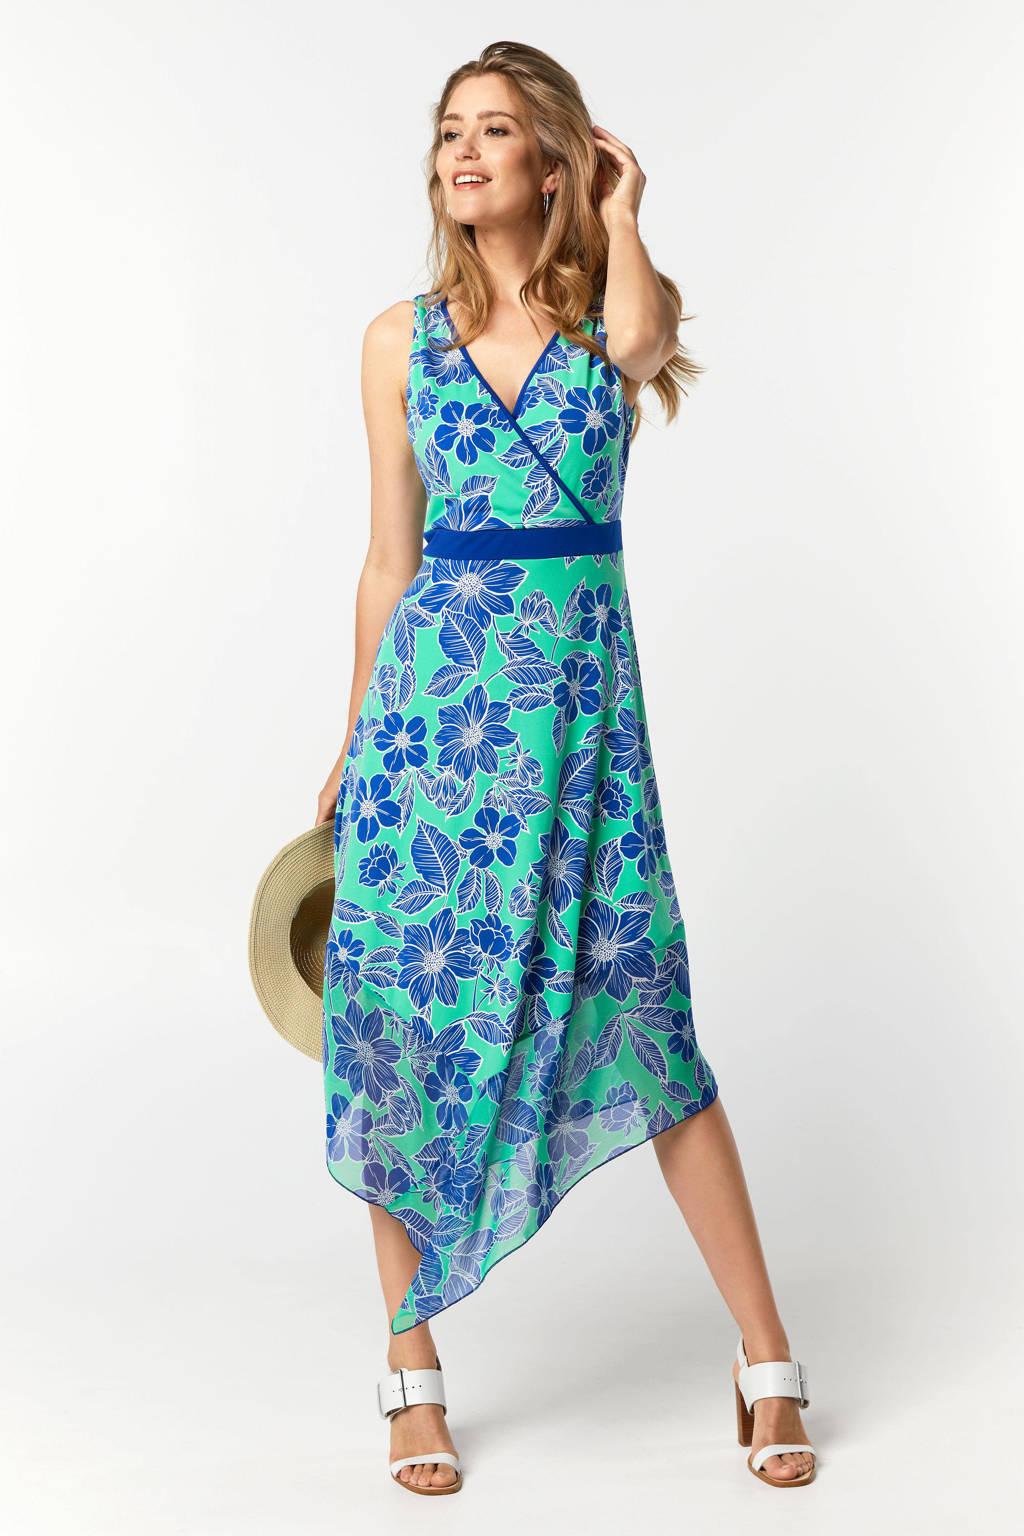 Miss Etam Regulier gebloemde jurk groen/blauw, Groen/blauw